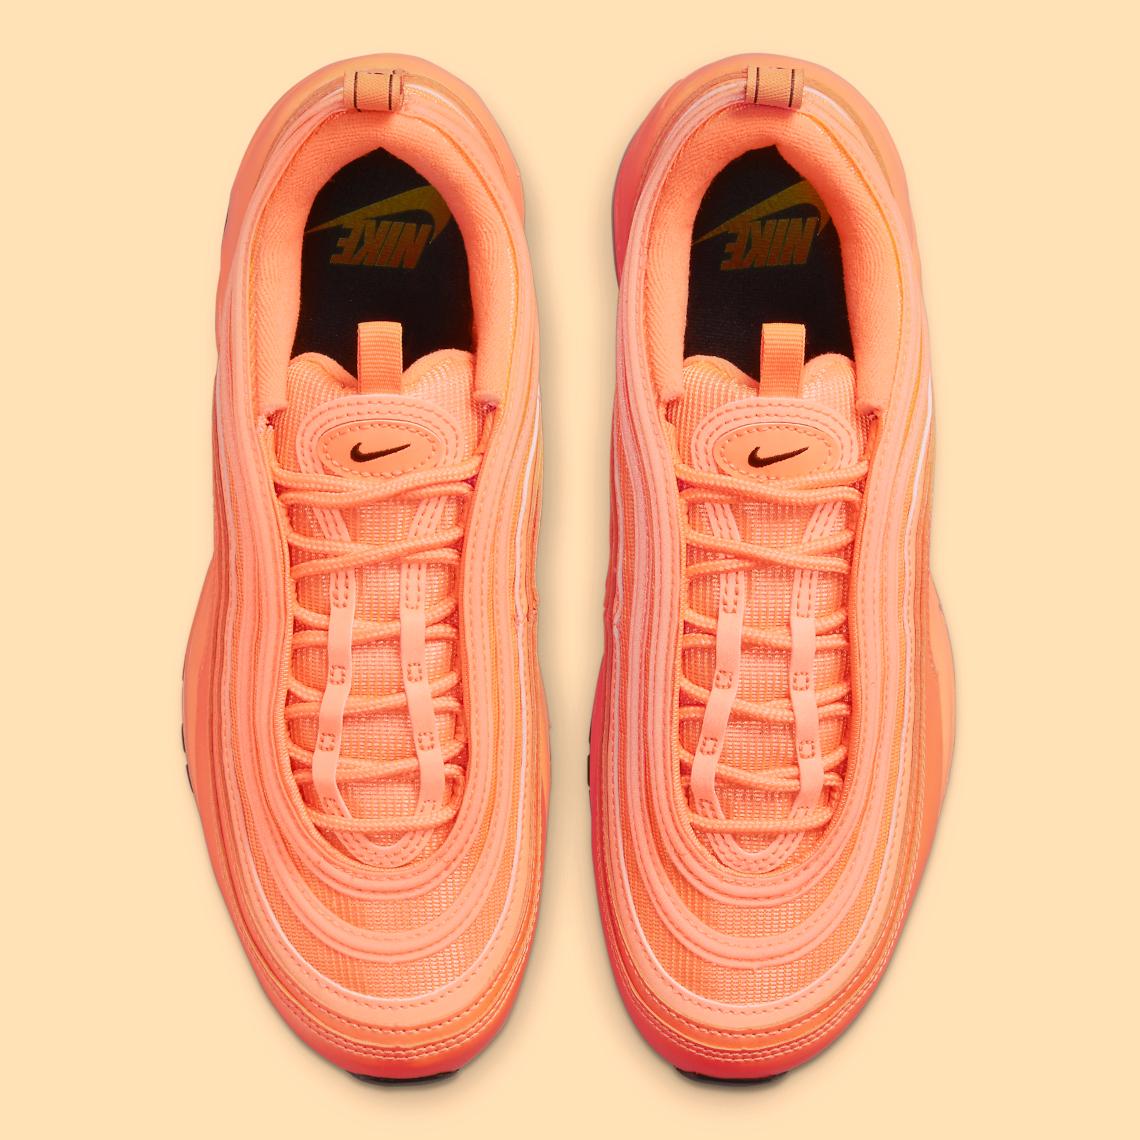 Nike Air Max 97 Orange Black DM8338-800 | SneakerNews.com